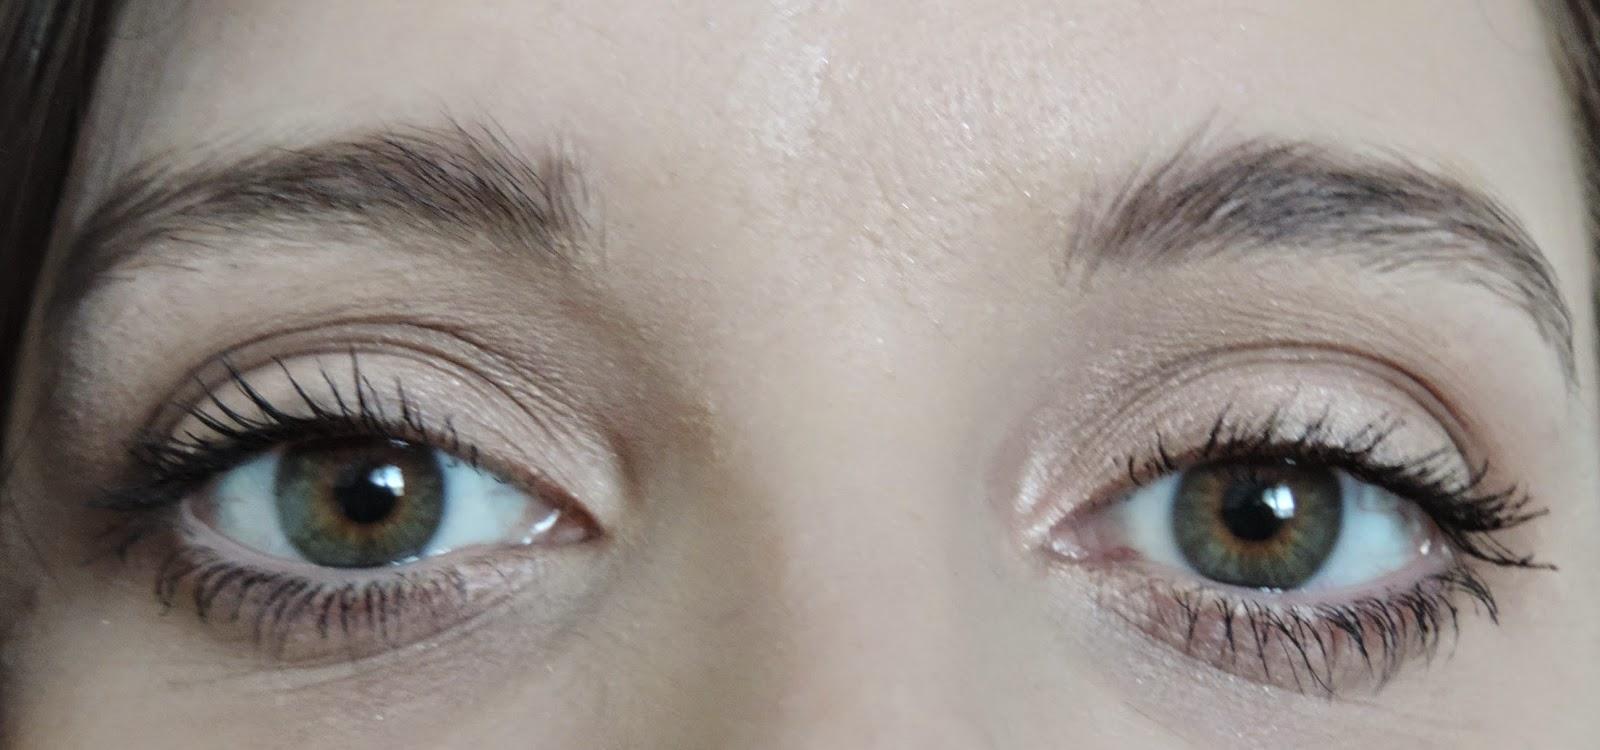 Benefit Roller Lash Mascara Applied